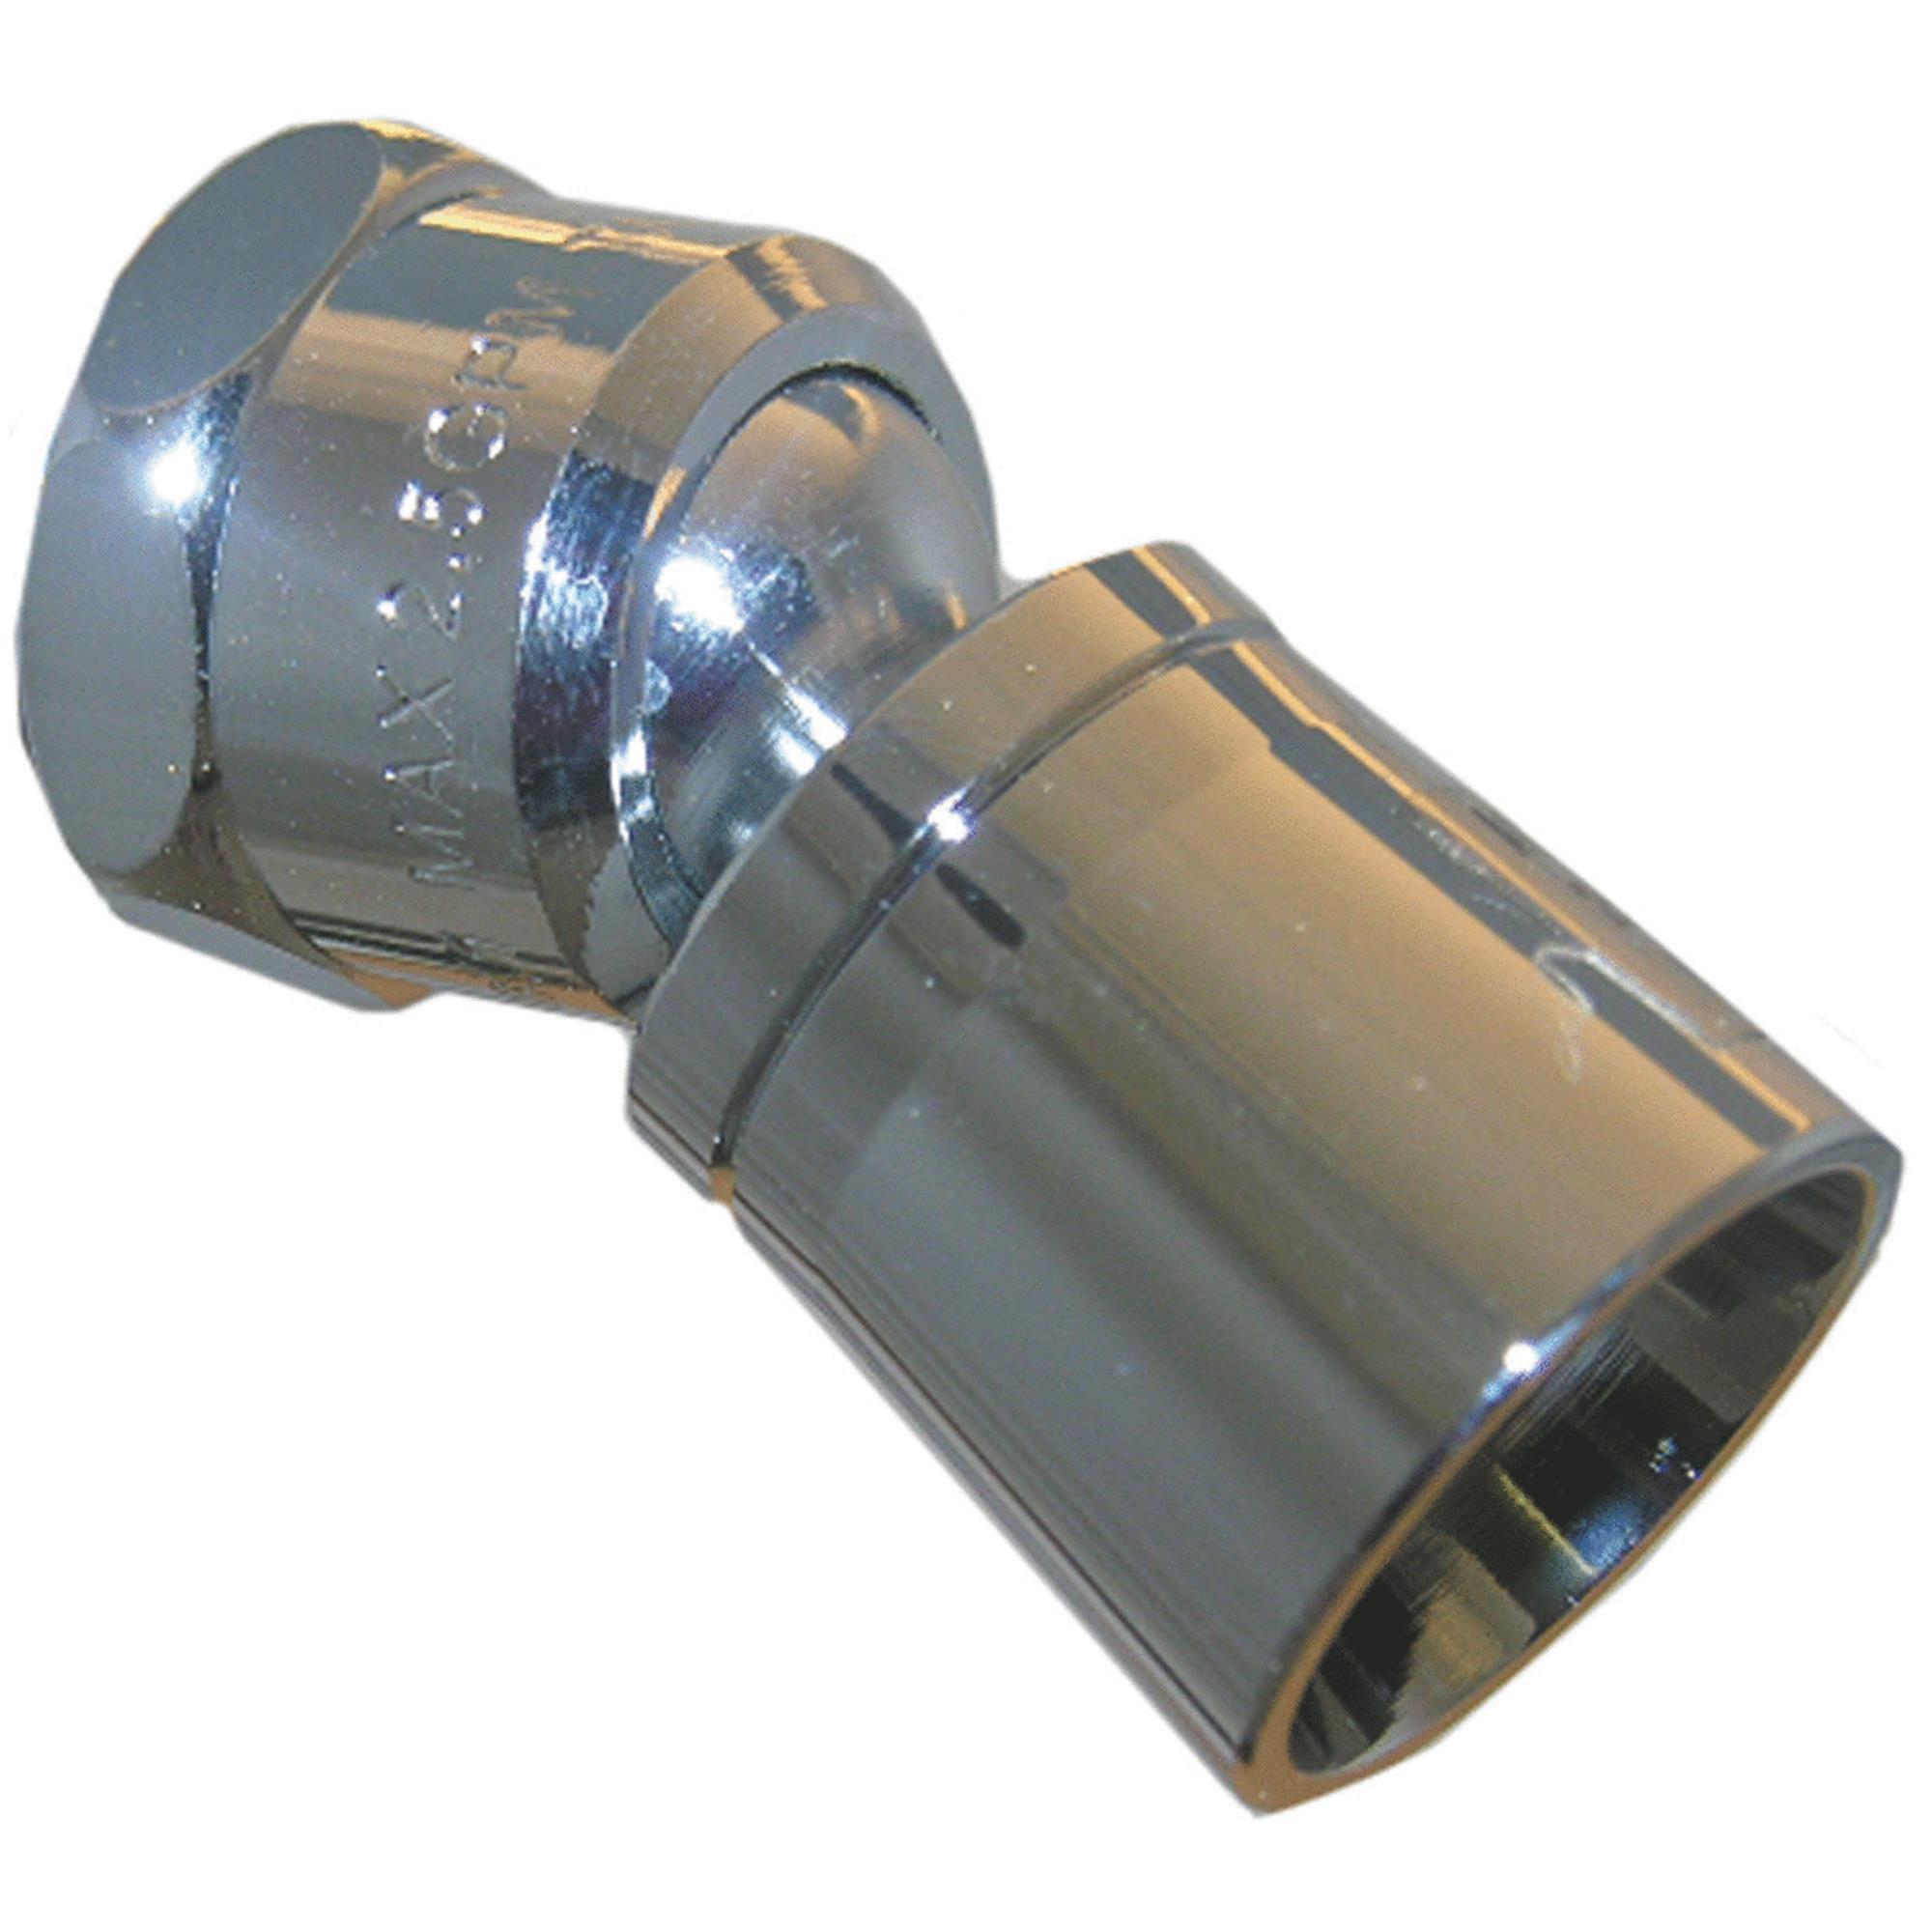 Lasco Water Saver Control 1-Spray Fixed Showerhead